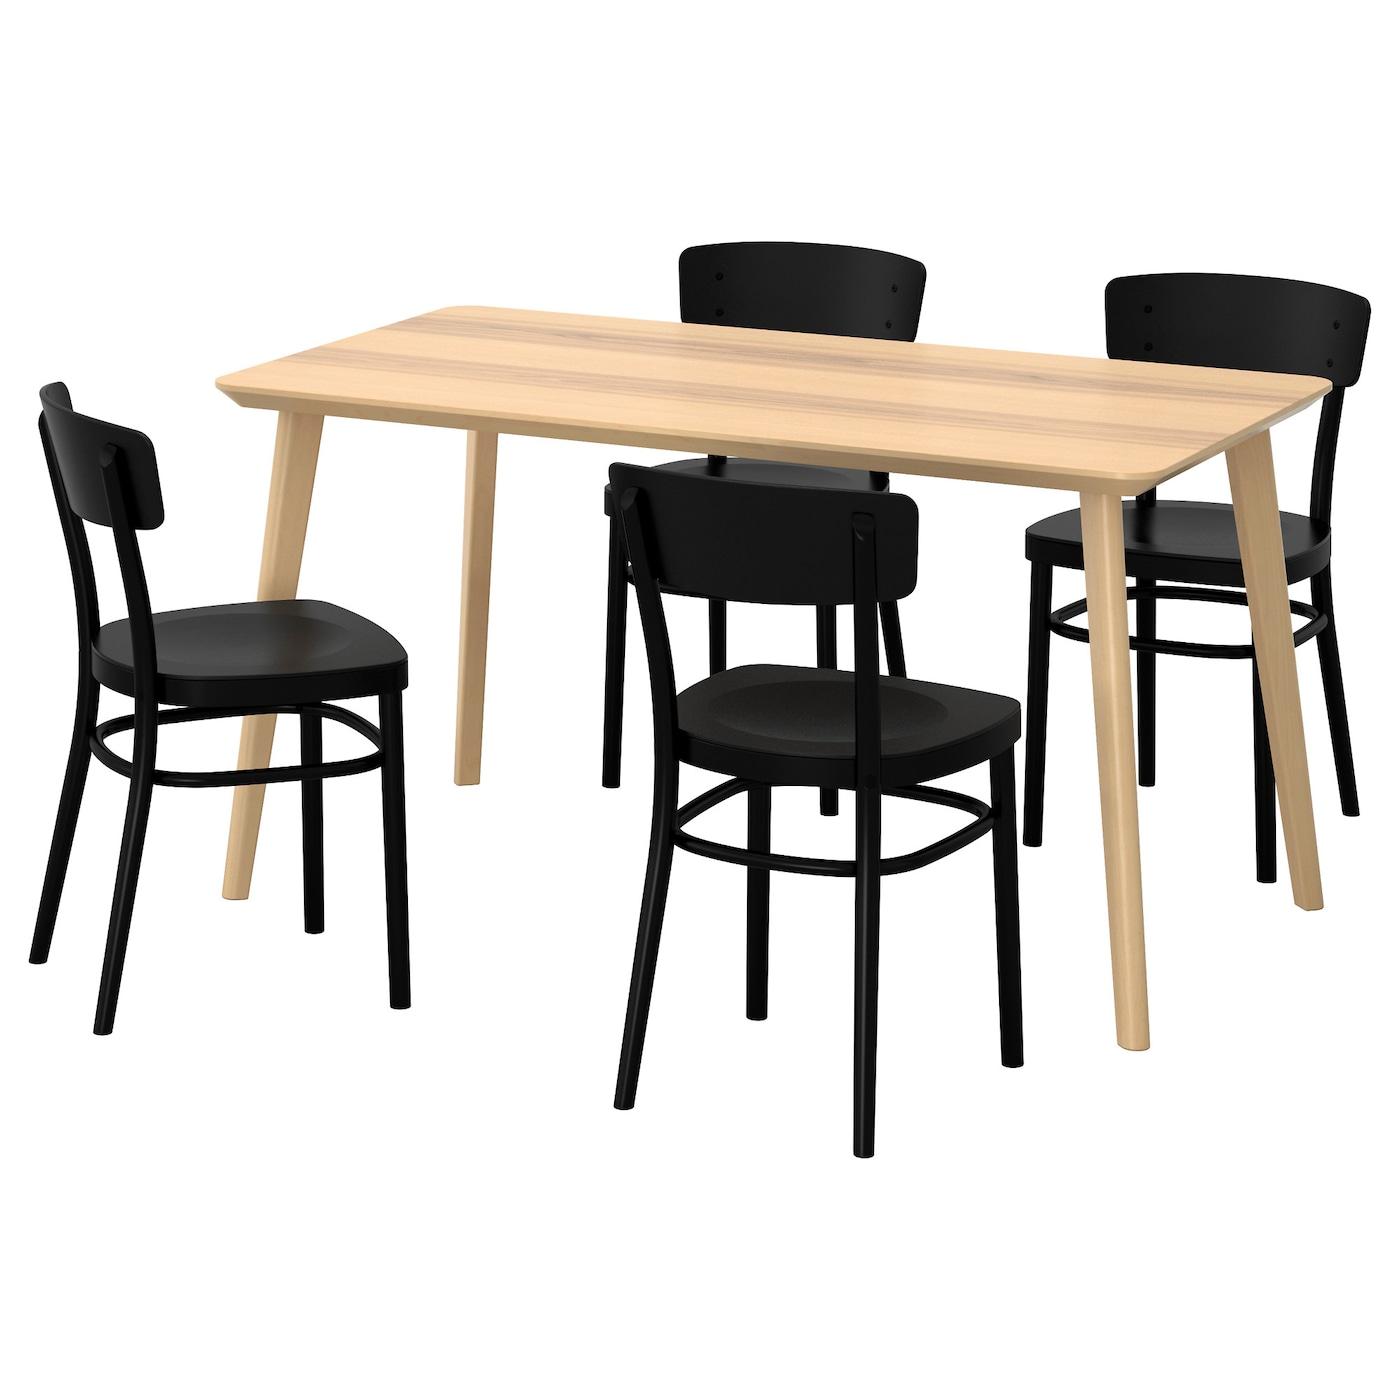 idolf lisabo table et 4 chaises plaqu fr ne noir 140x78 cm ikea. Black Bedroom Furniture Sets. Home Design Ideas